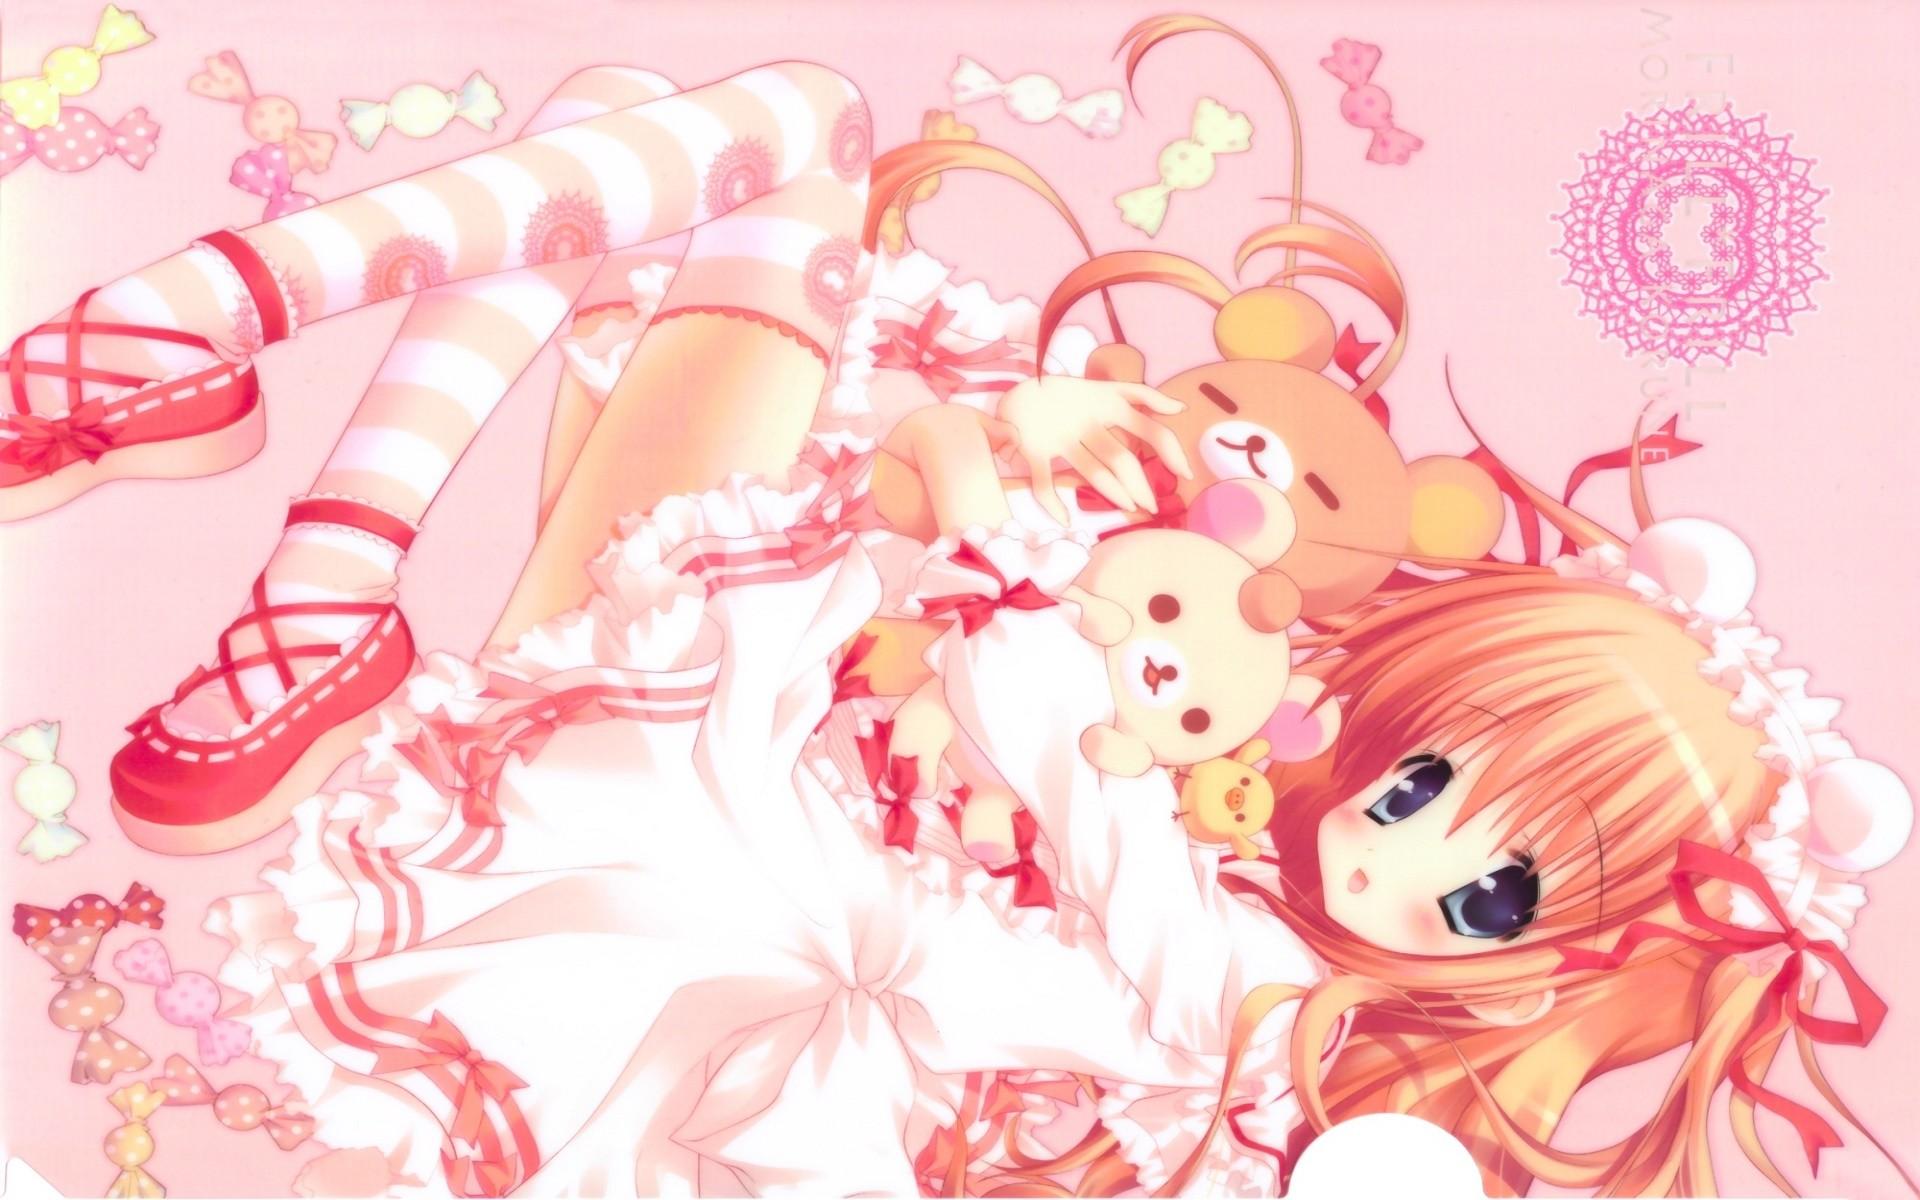 Desktop hd pink kawaii background wallpapers HD.